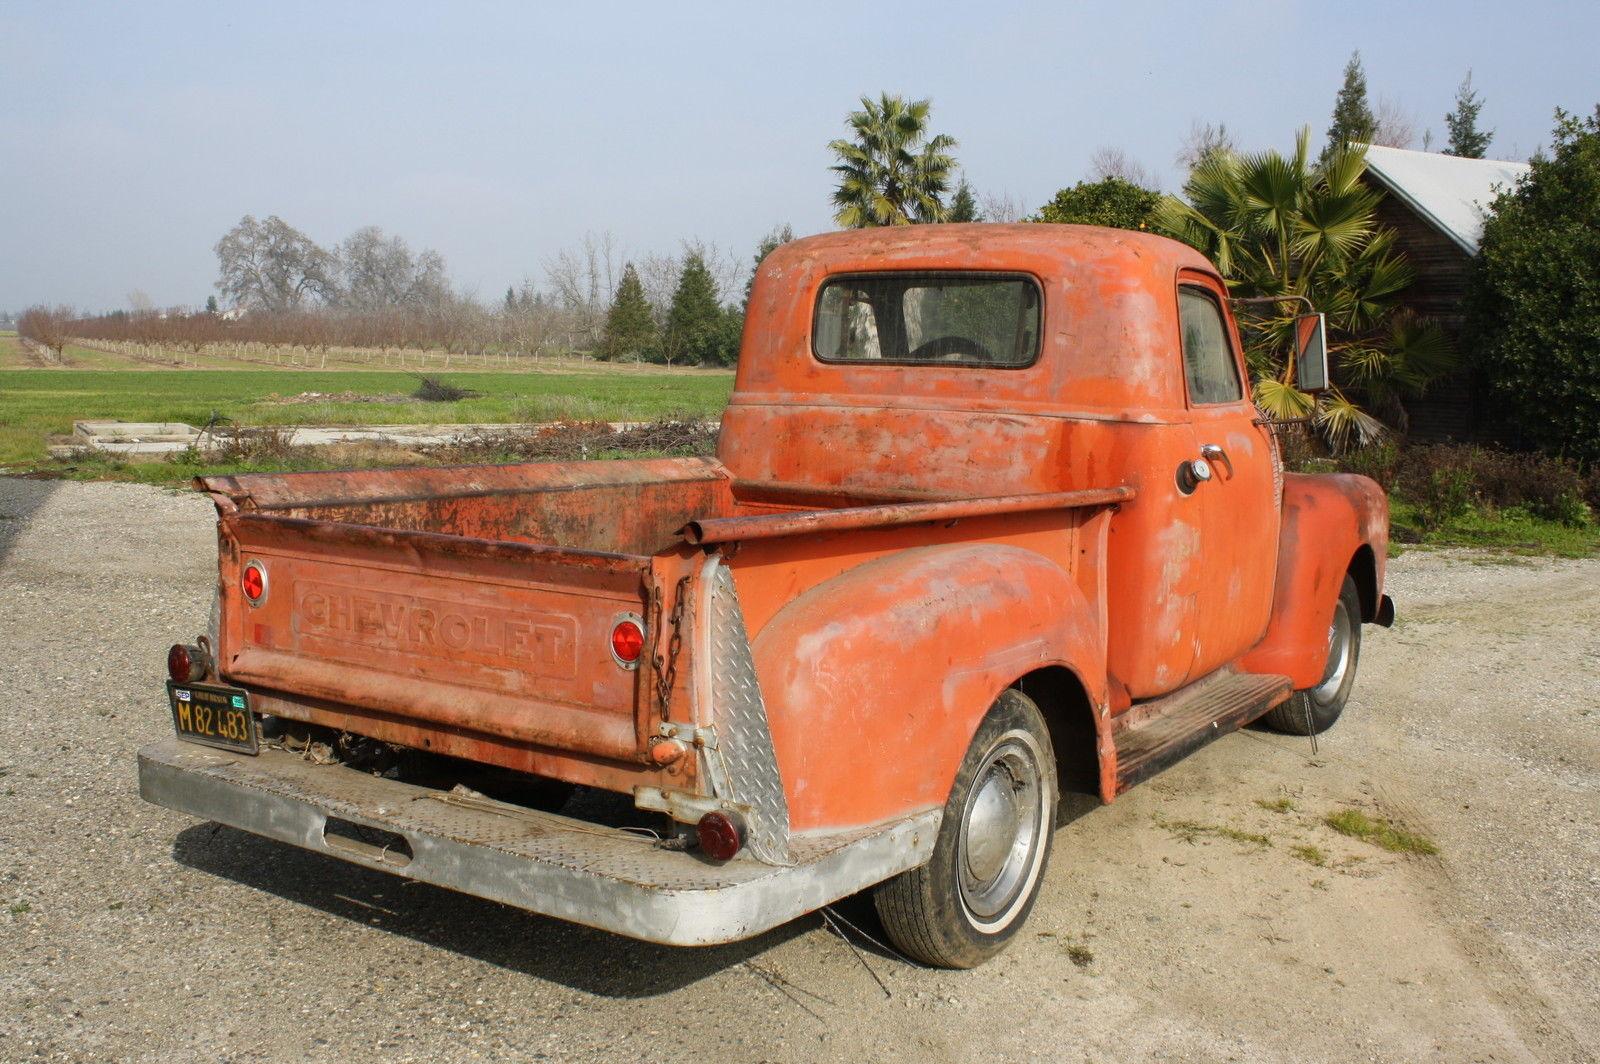 1950 chevrolet pick up original 1949 1951 1952 1953 1954 1955 farm truck for sale in sacramento. Black Bedroom Furniture Sets. Home Design Ideas